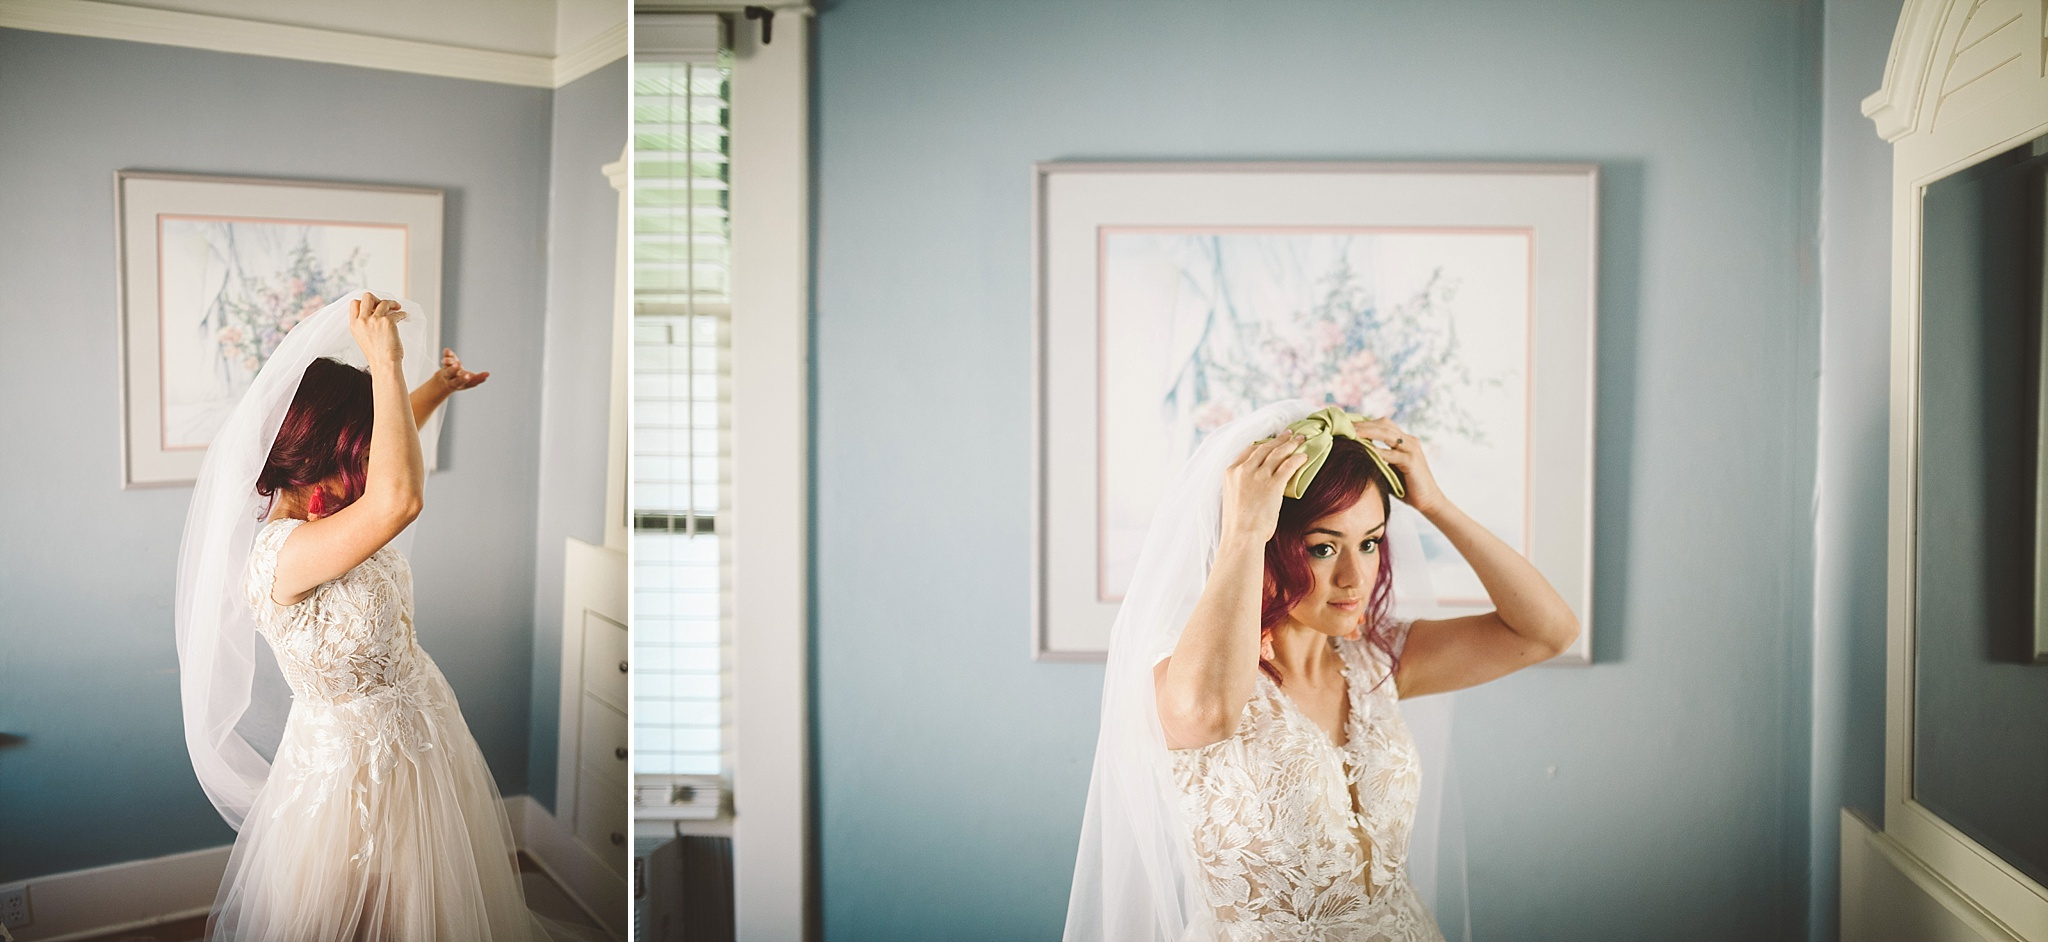 bride puts on her dress pnw